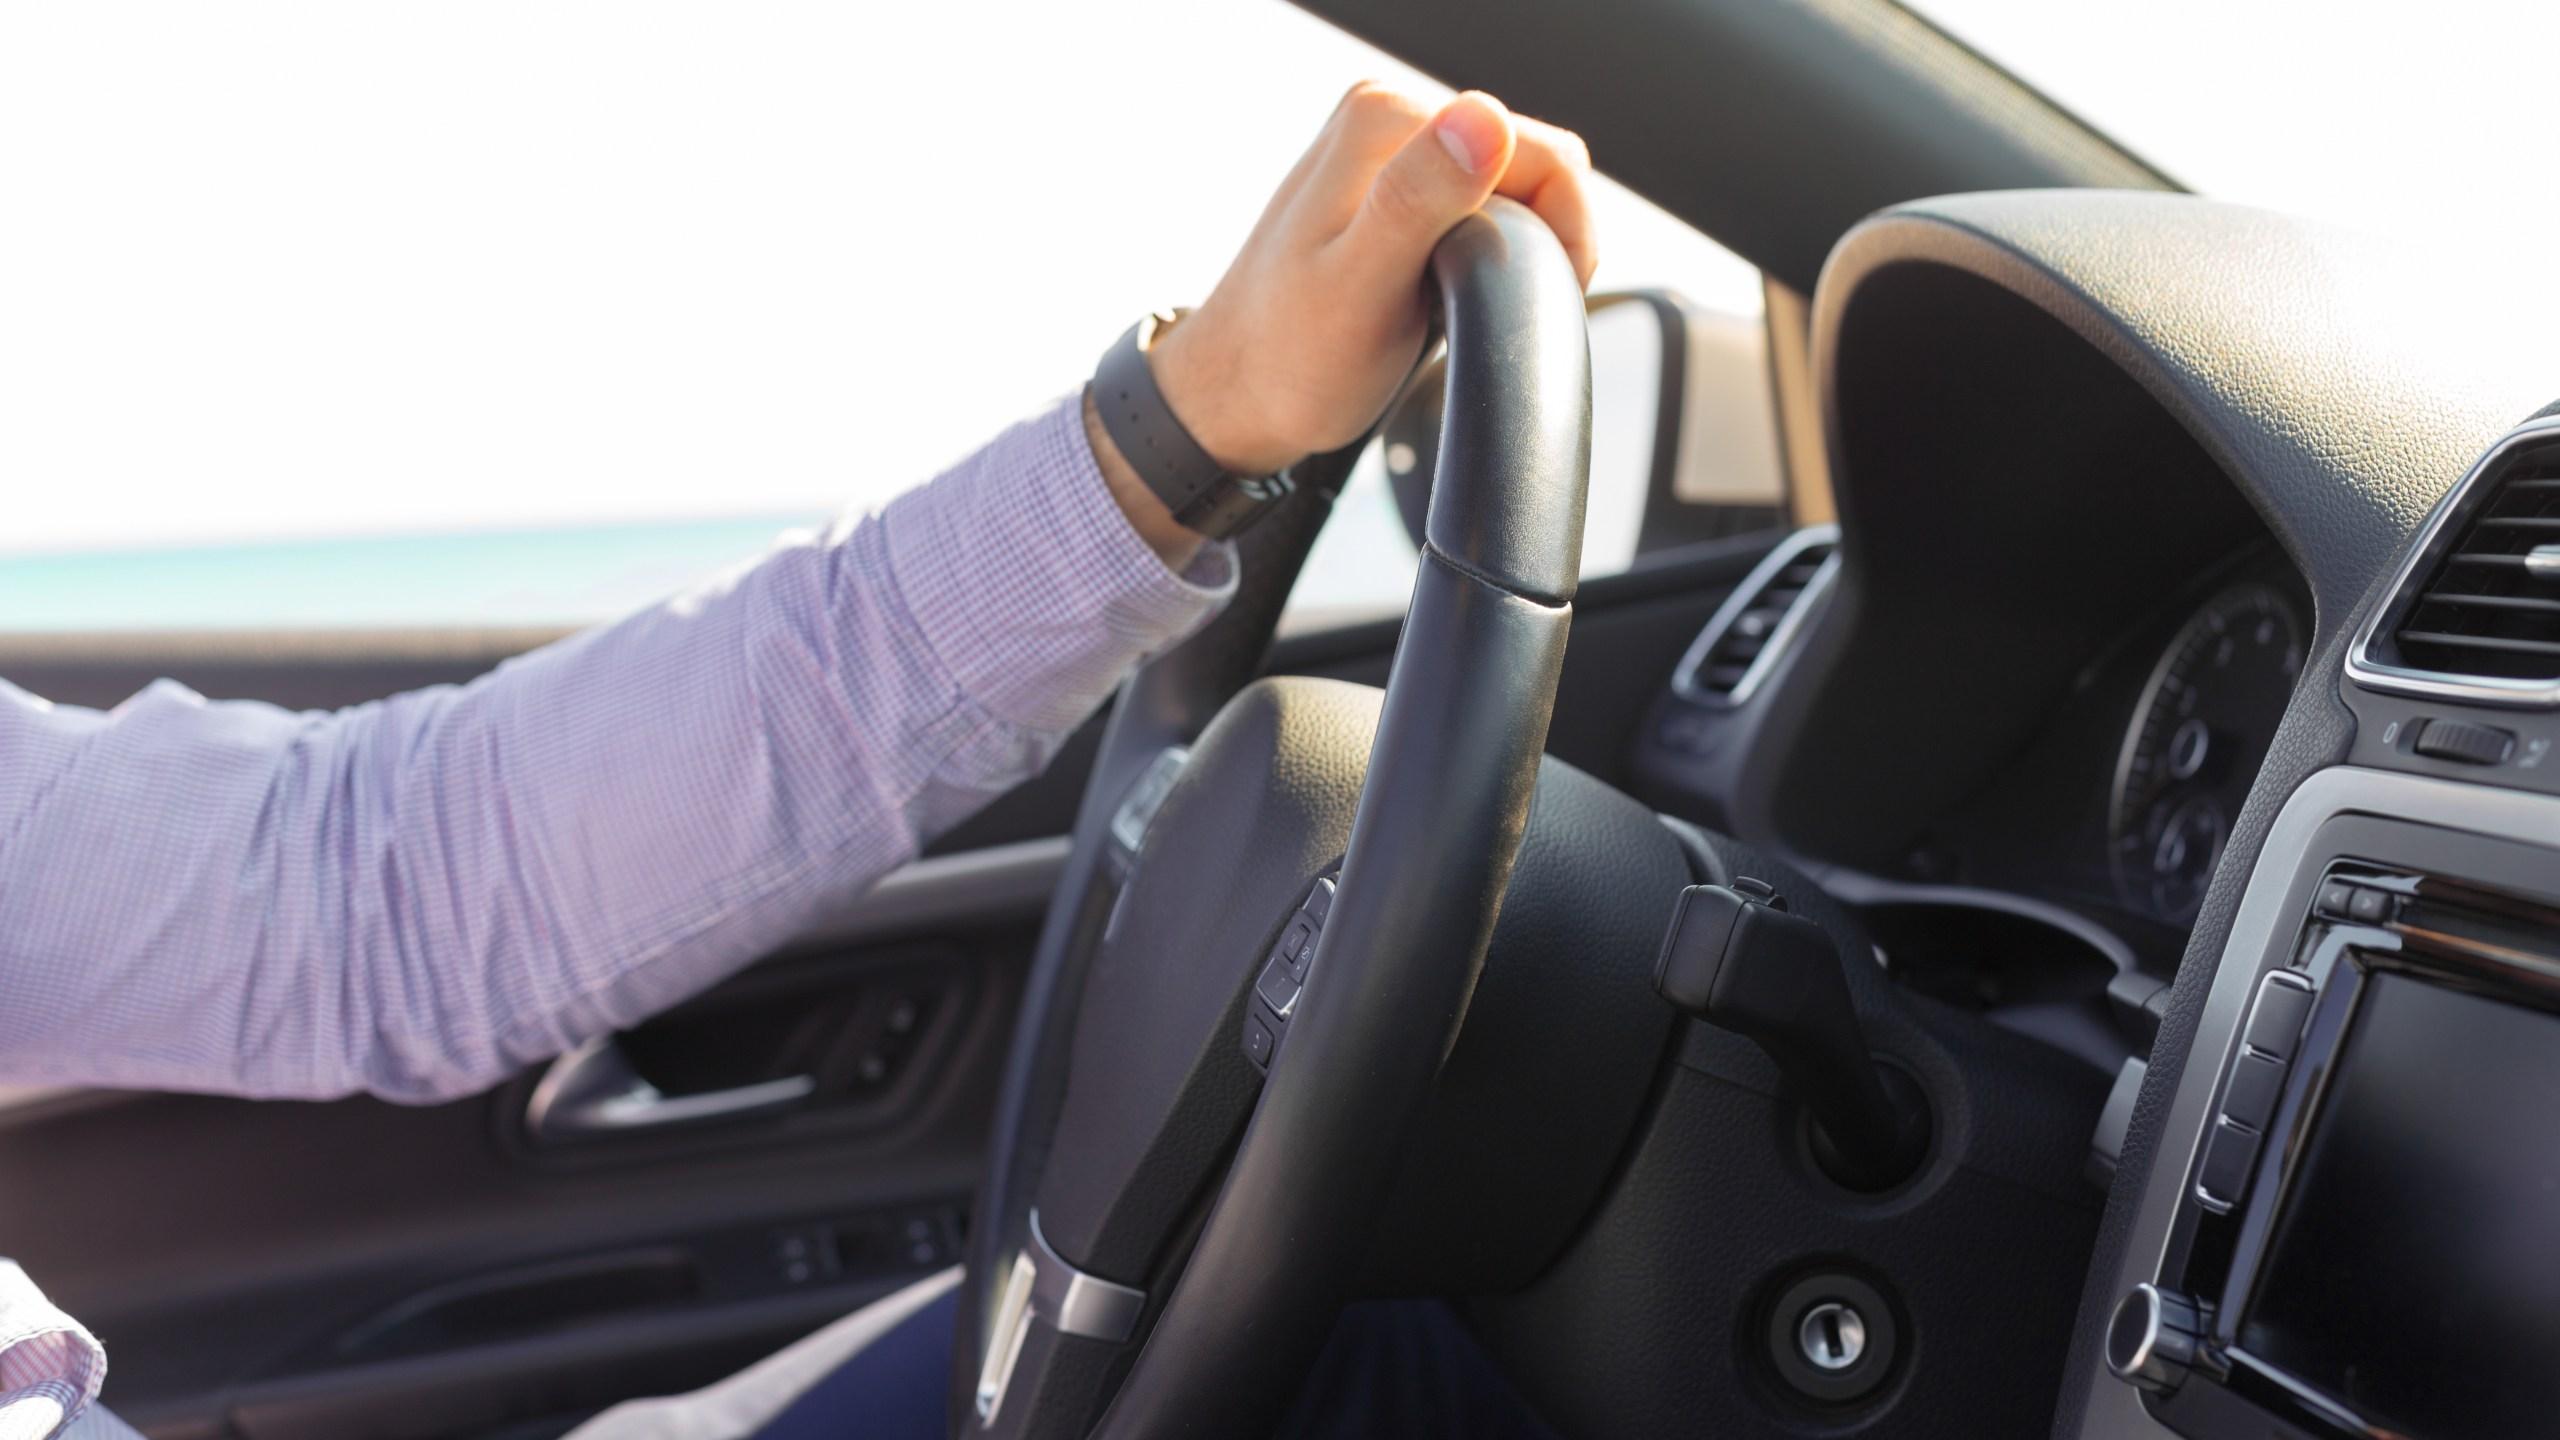 shutterstock_670879144 man driving driver car vehicle_328137